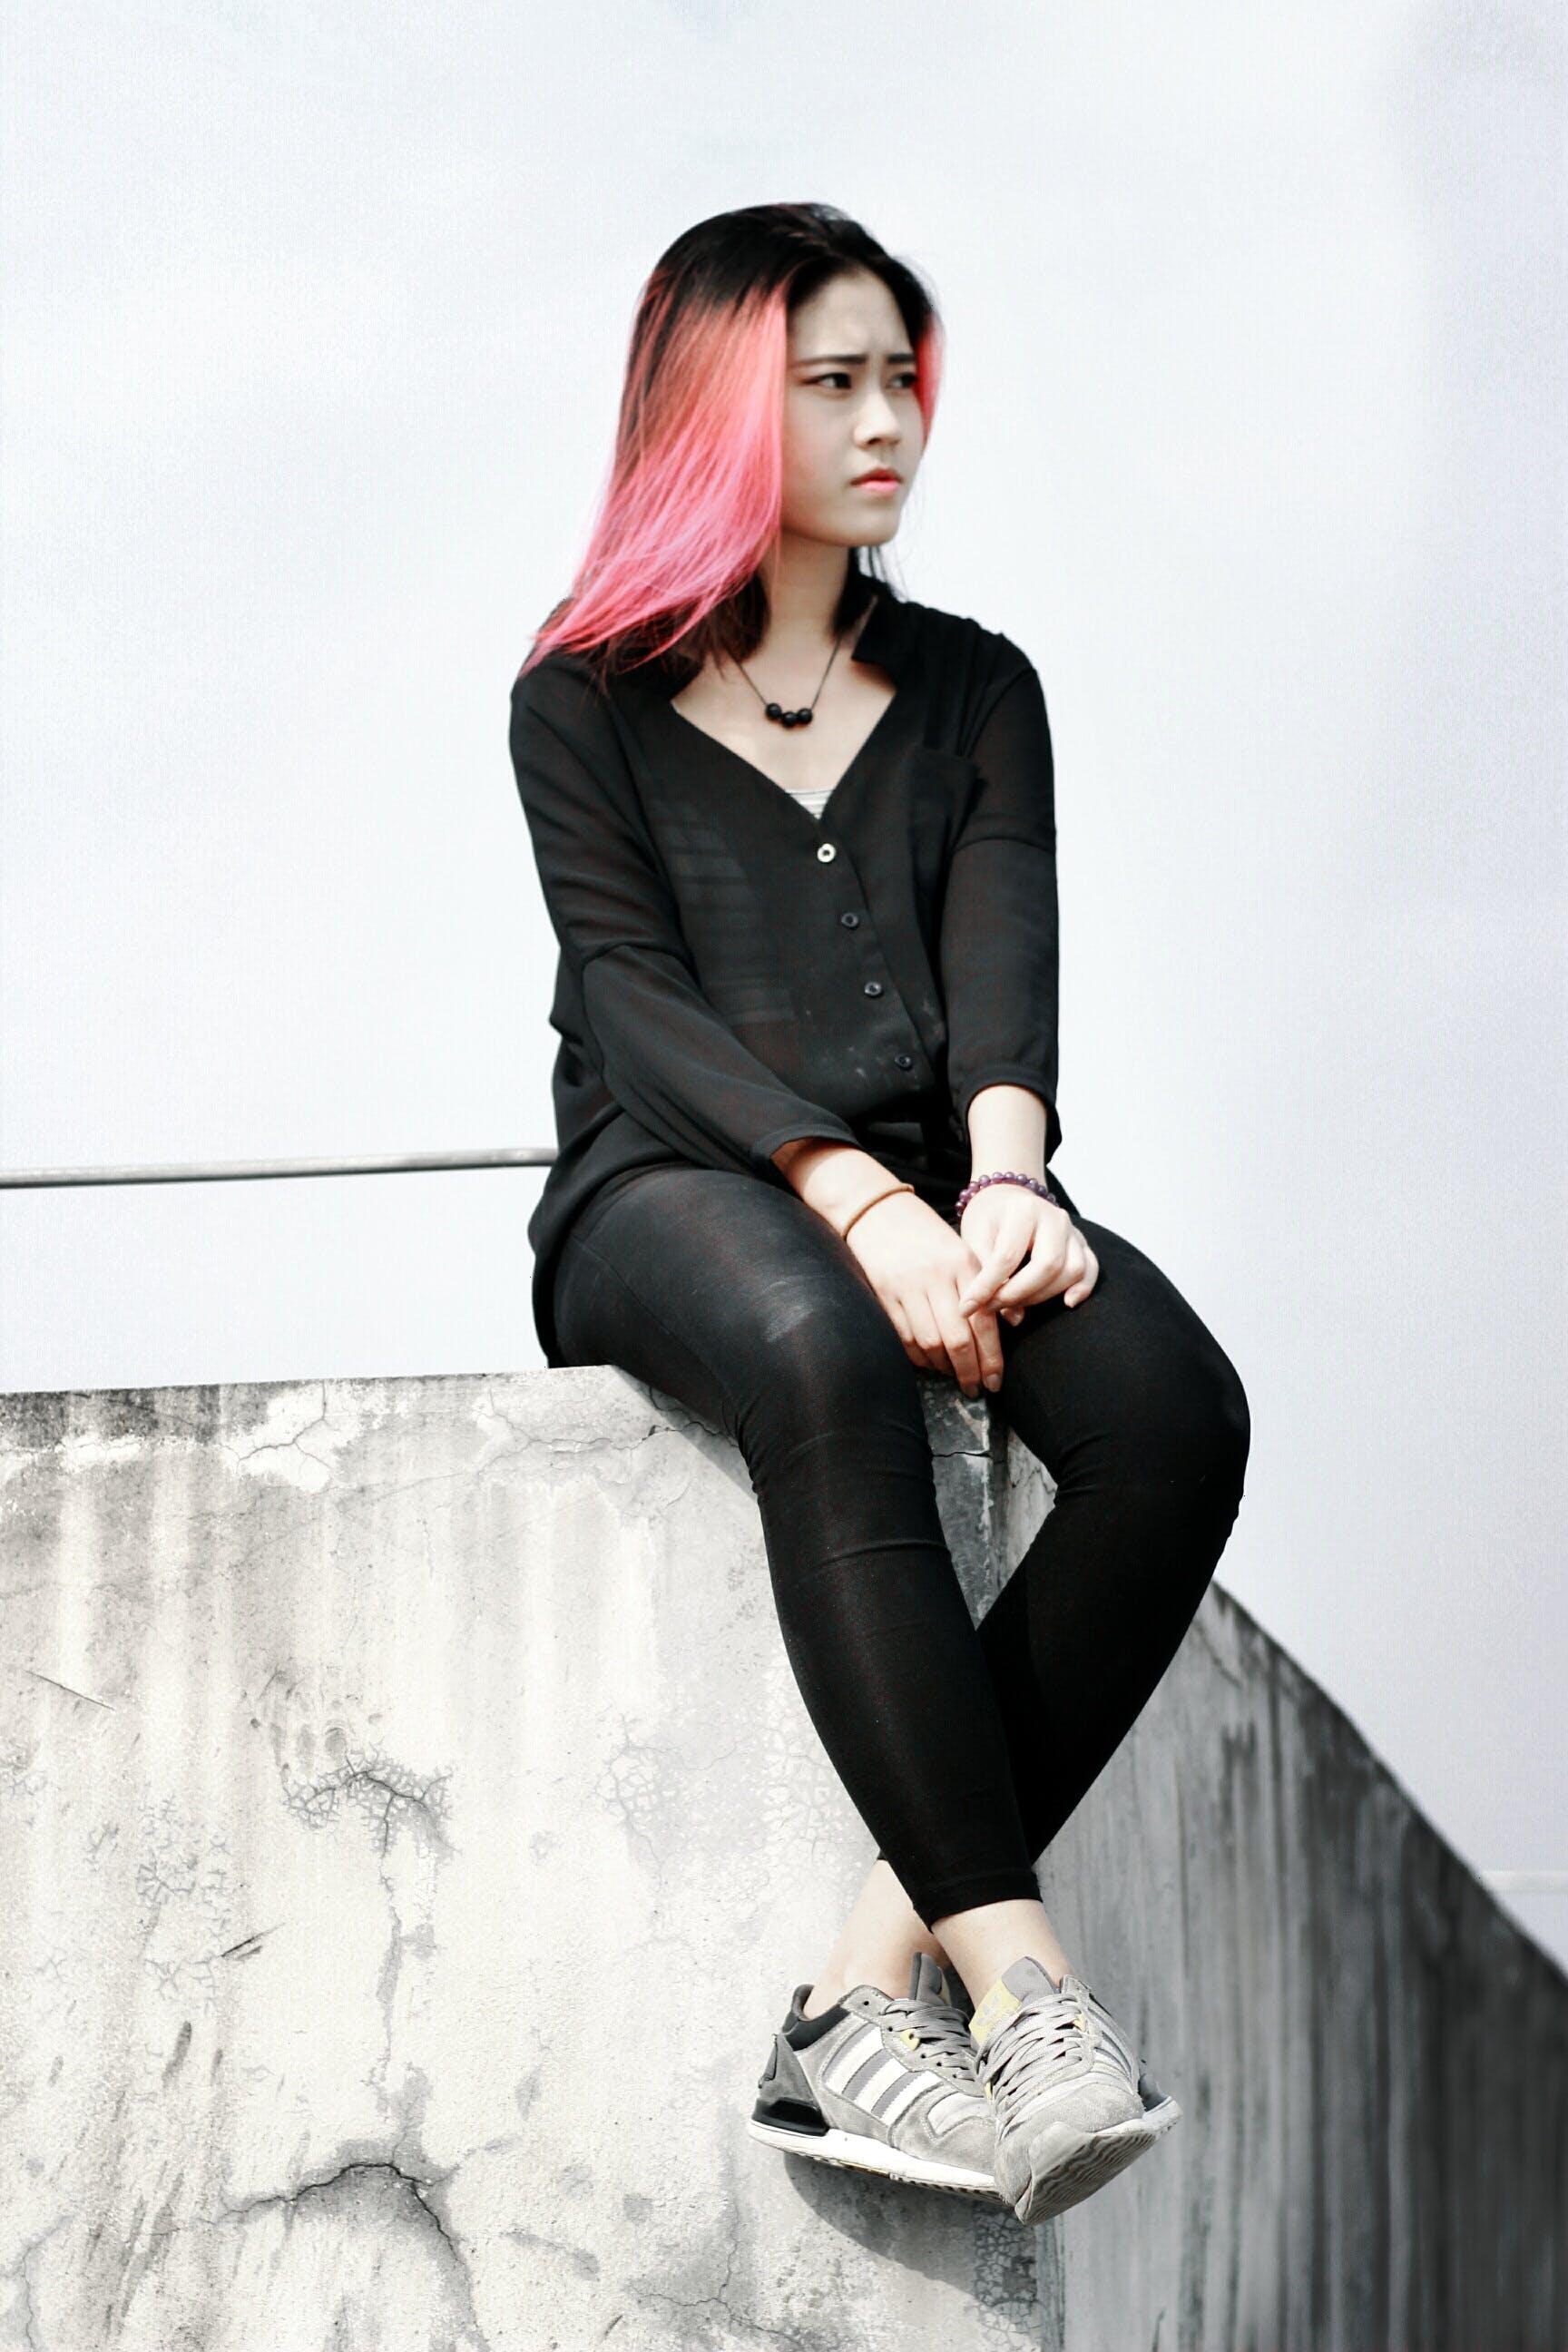 Free stock photo of woman, model, figure, sad